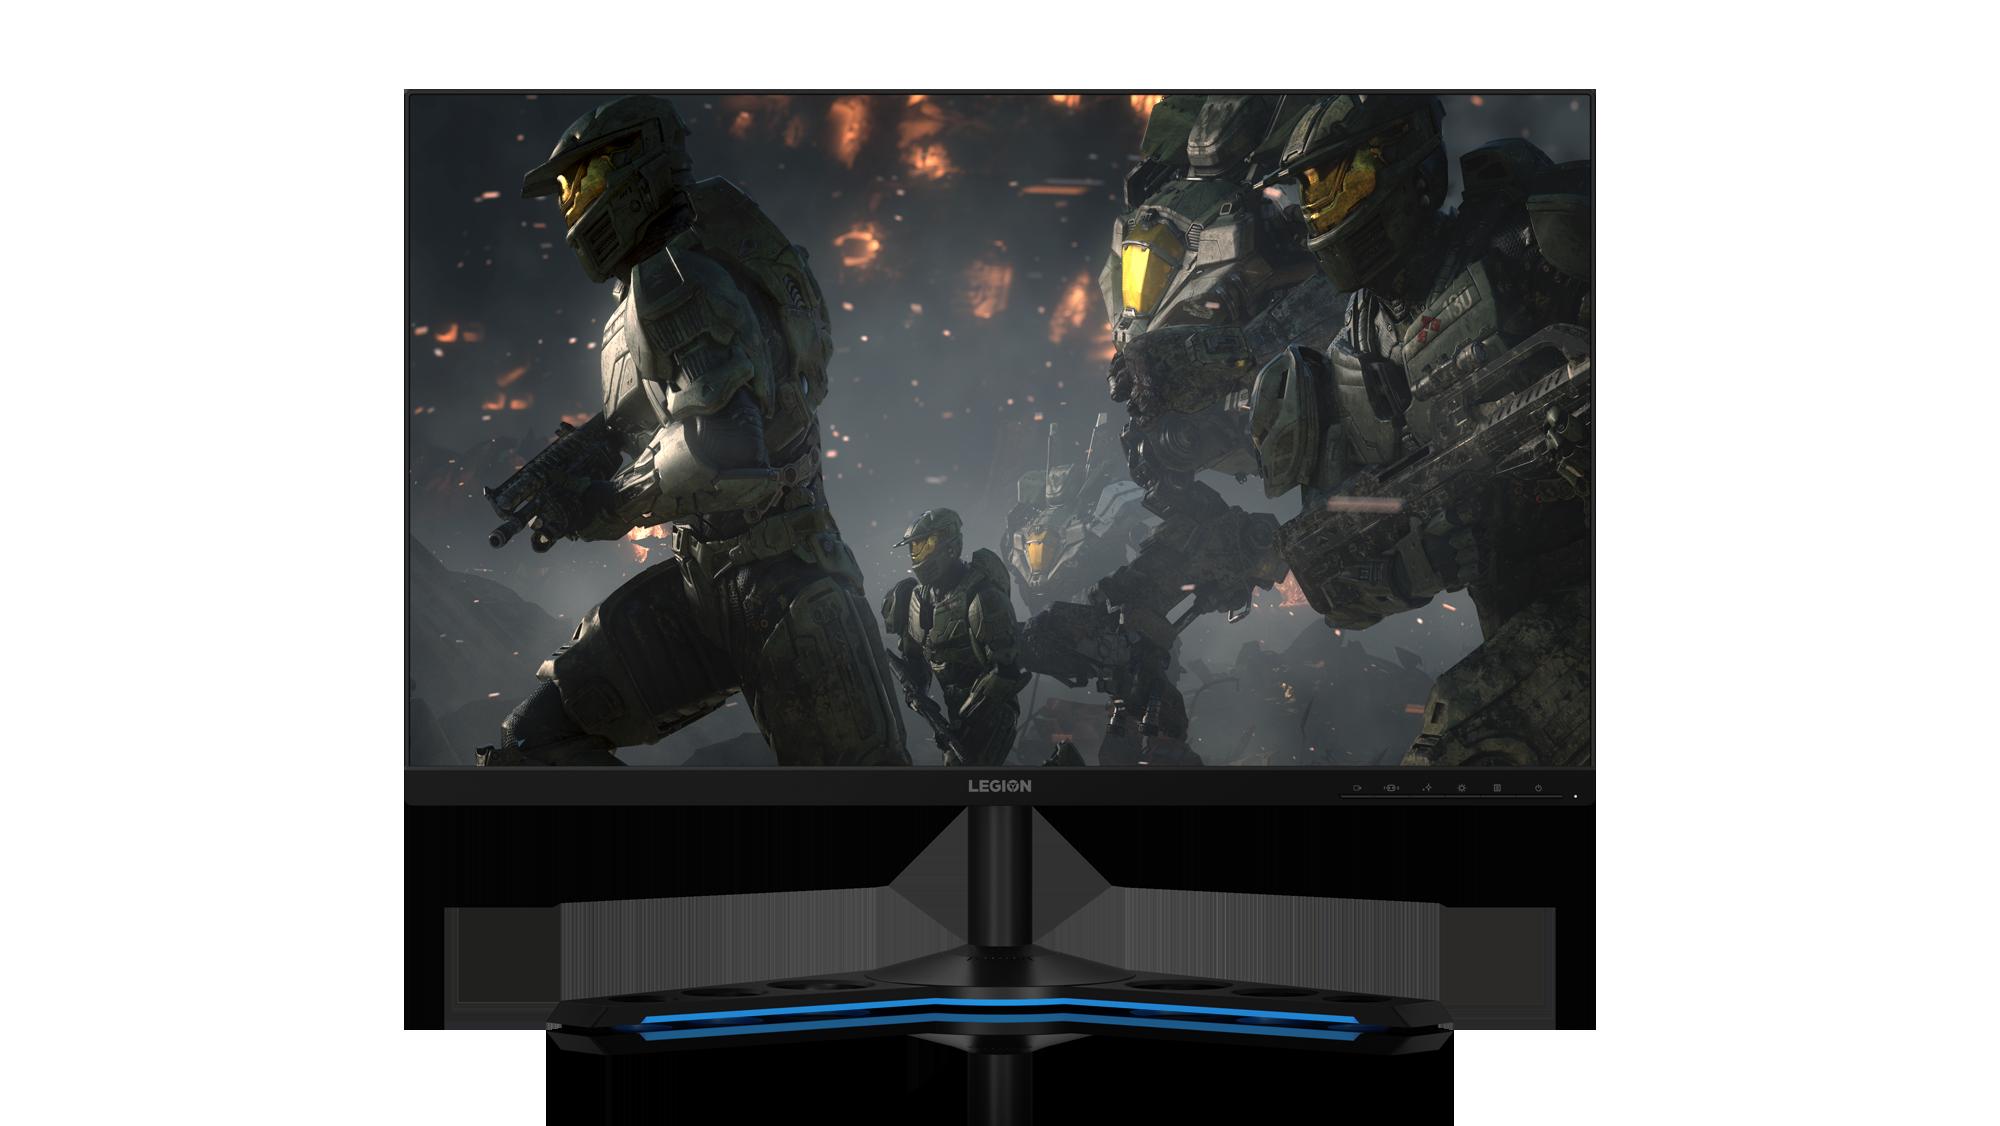 E3 2019: Biggest Blockbusters, Cyberpunk 2077 and Watch Dogs: Legion